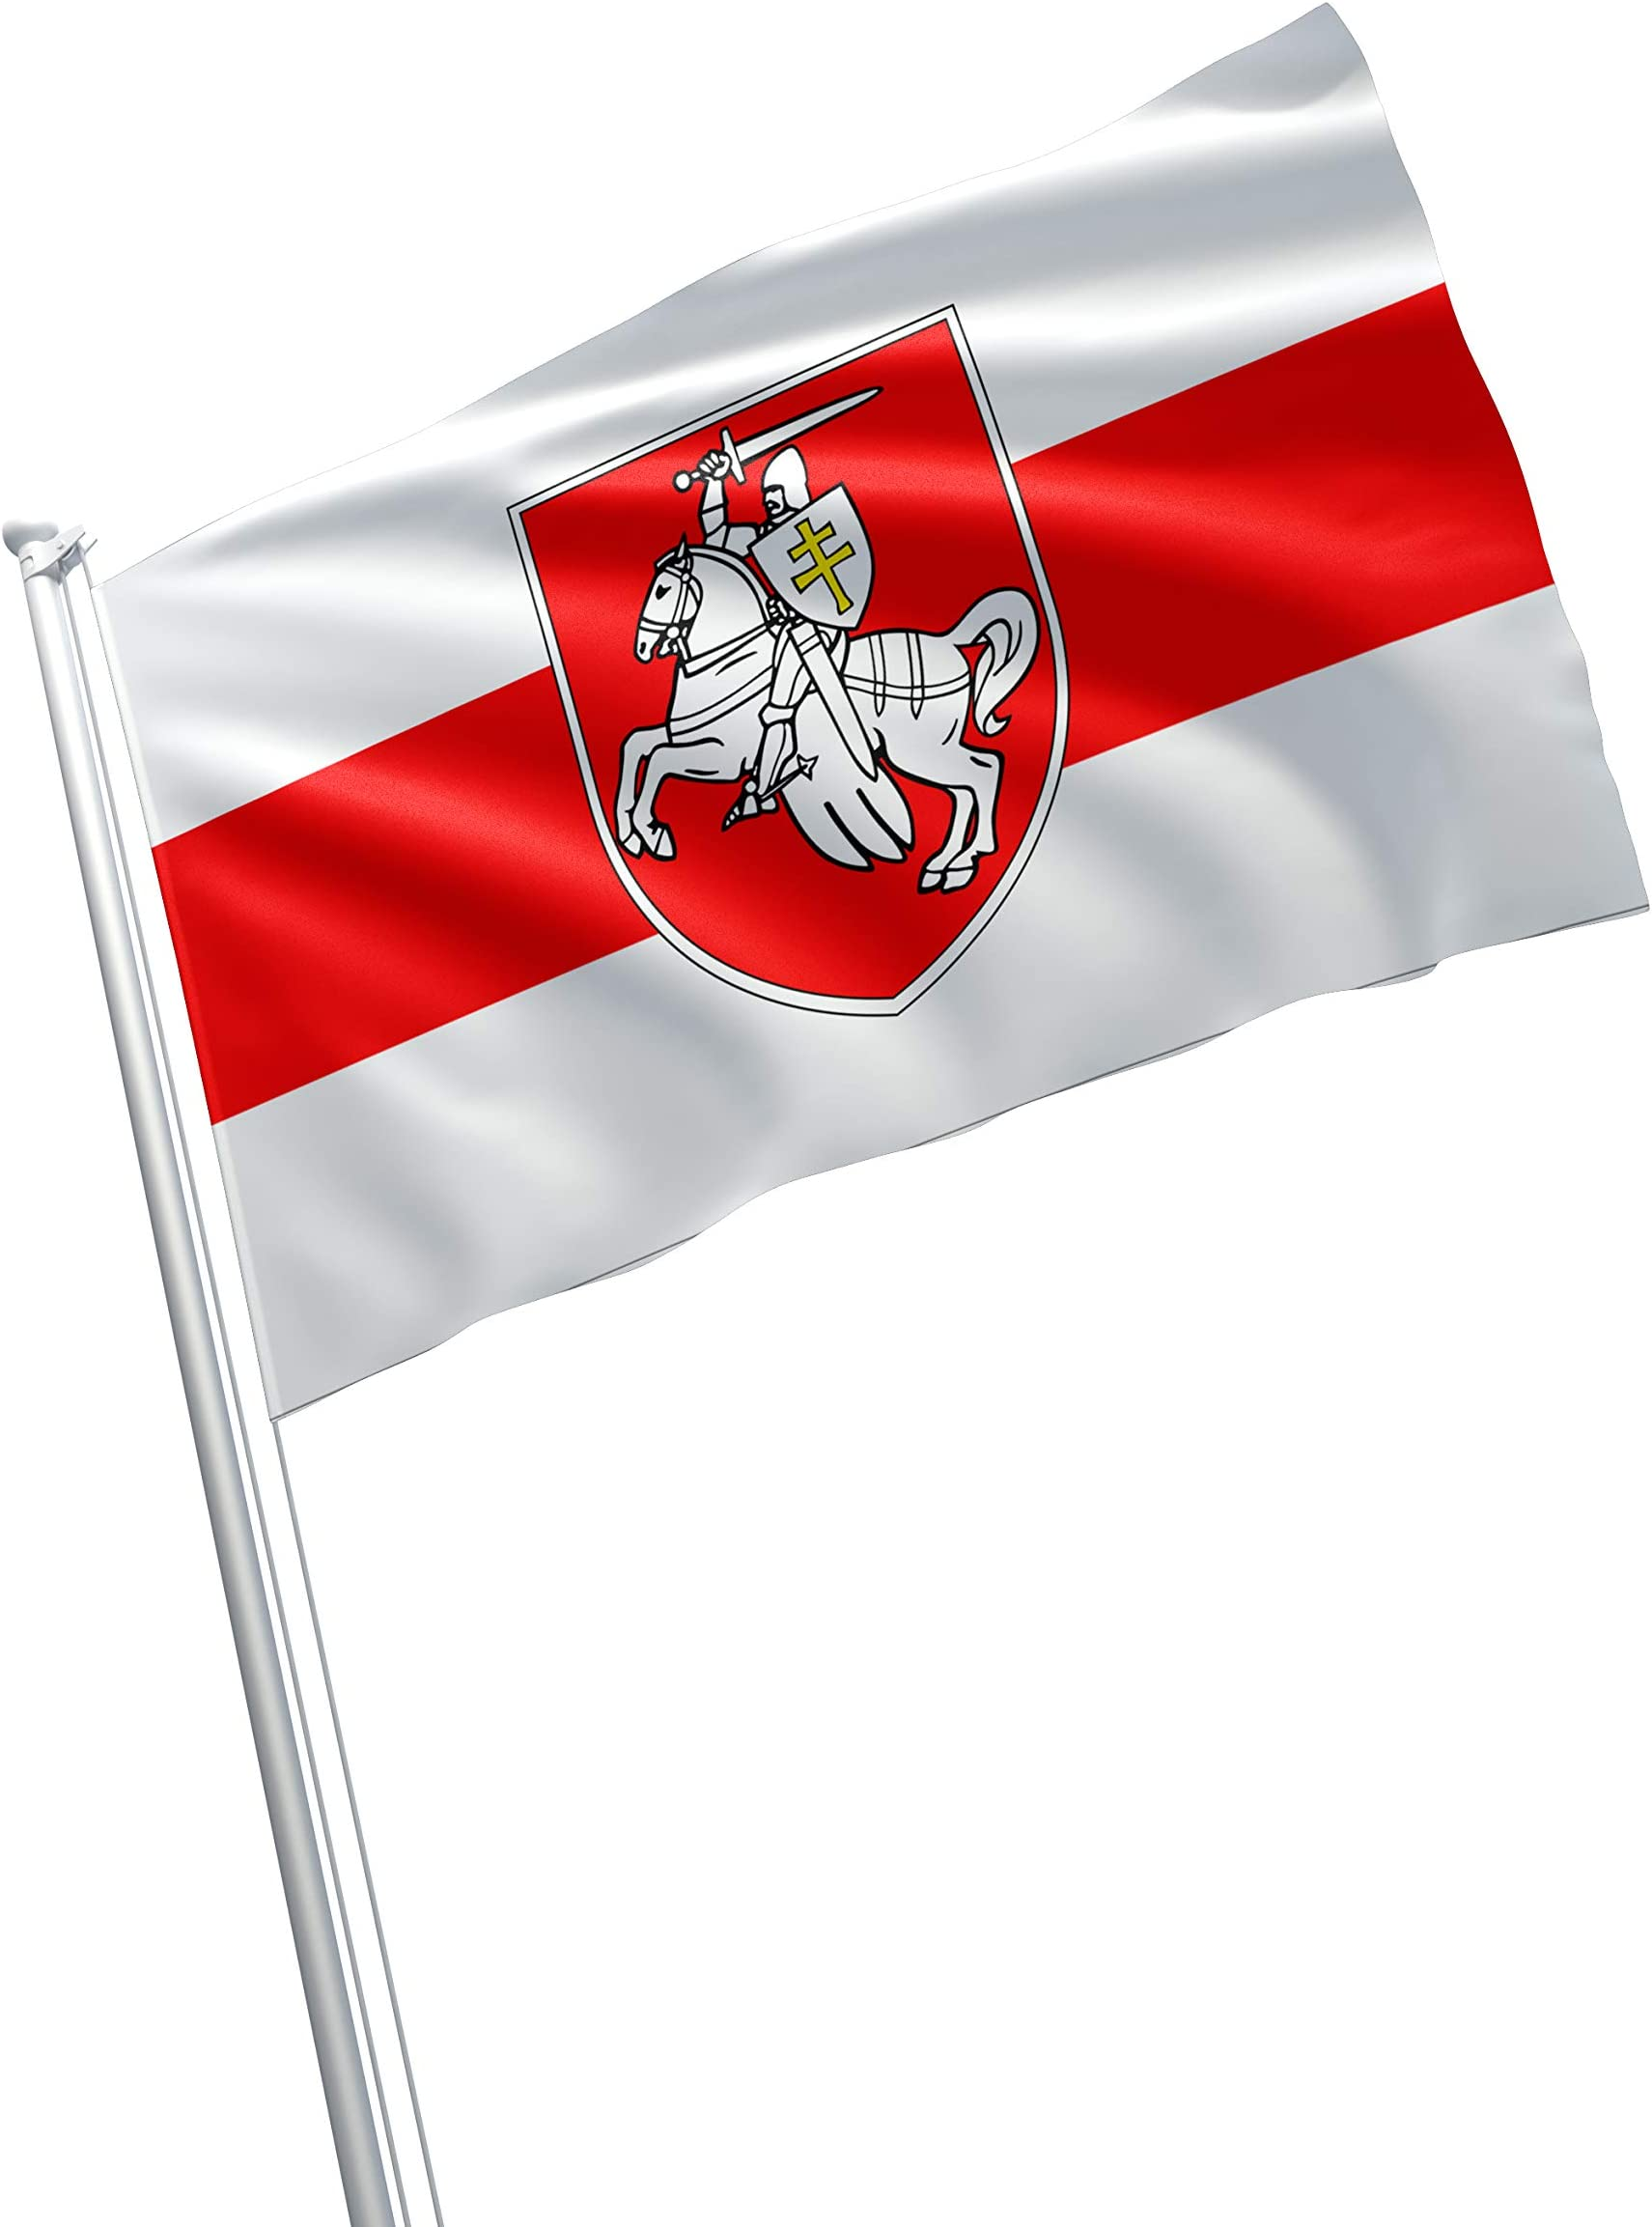 Belarus Minsk Knight Coat Of Arms Pogonia Pogonya Pahonya погоня пагоня Bnr Bnf Opposition Historical 3x5 Feet Flag Banner Vivid Color Double Stitched Brass Grommets Garden Outdoor